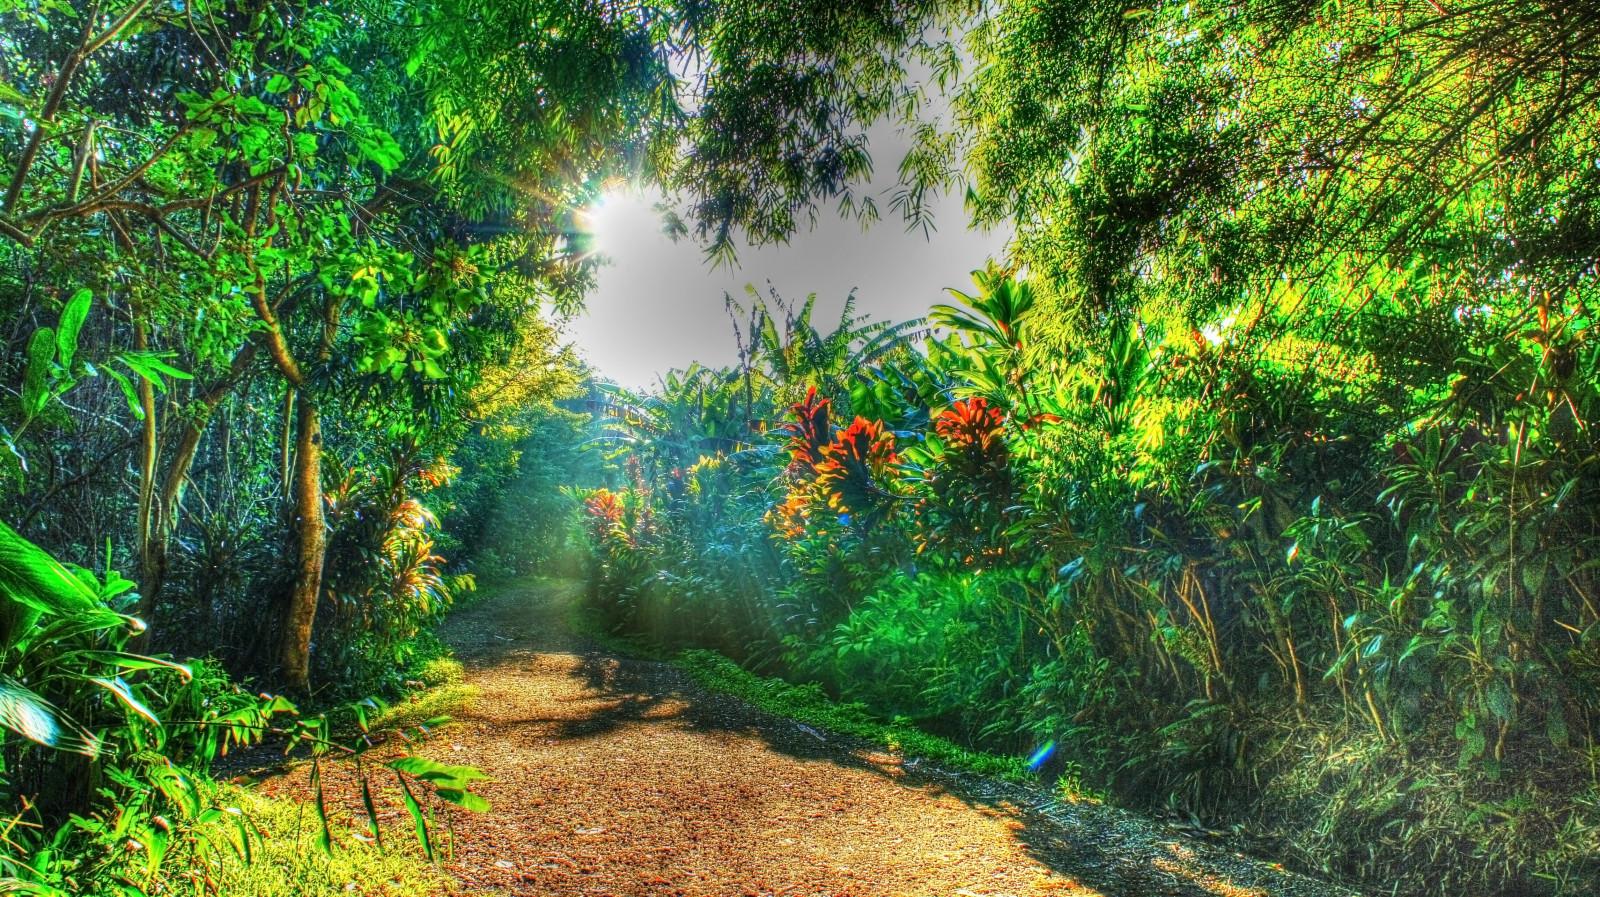 Wallpaper Sunlight Waterfall Garden Nature Beach Green Palm Trees Jungle Hawaii Tropical Water Forest Rainforest Isle Of Maui Tree